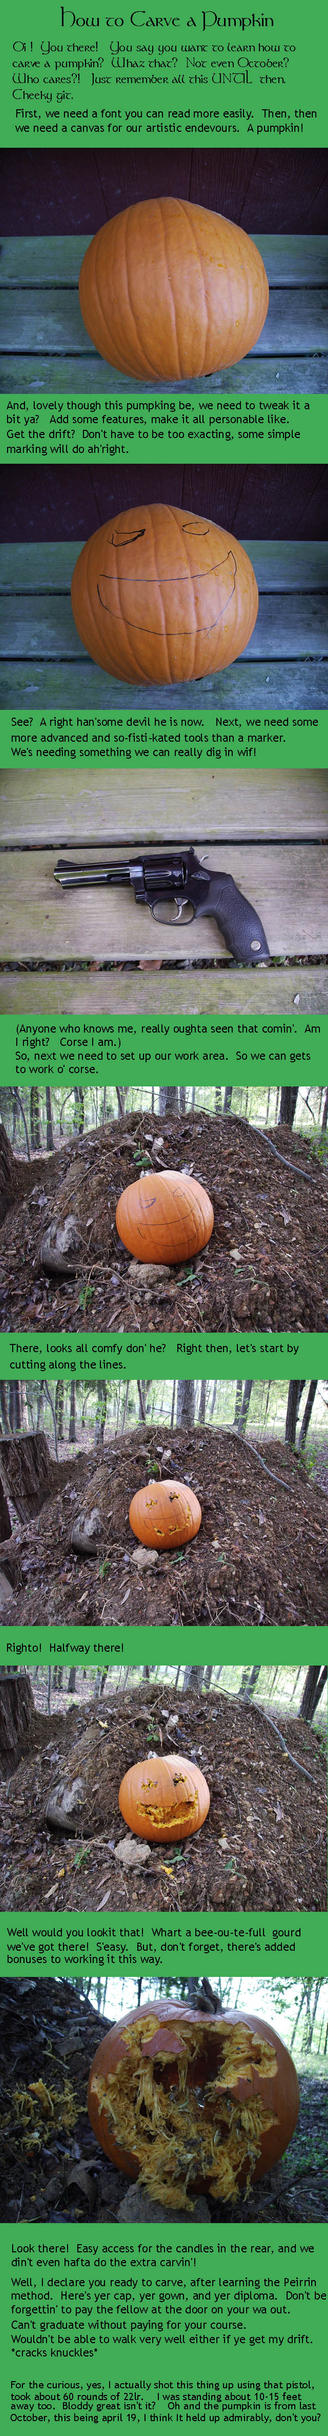 Pumpkin Carving Tutorial by peirrin